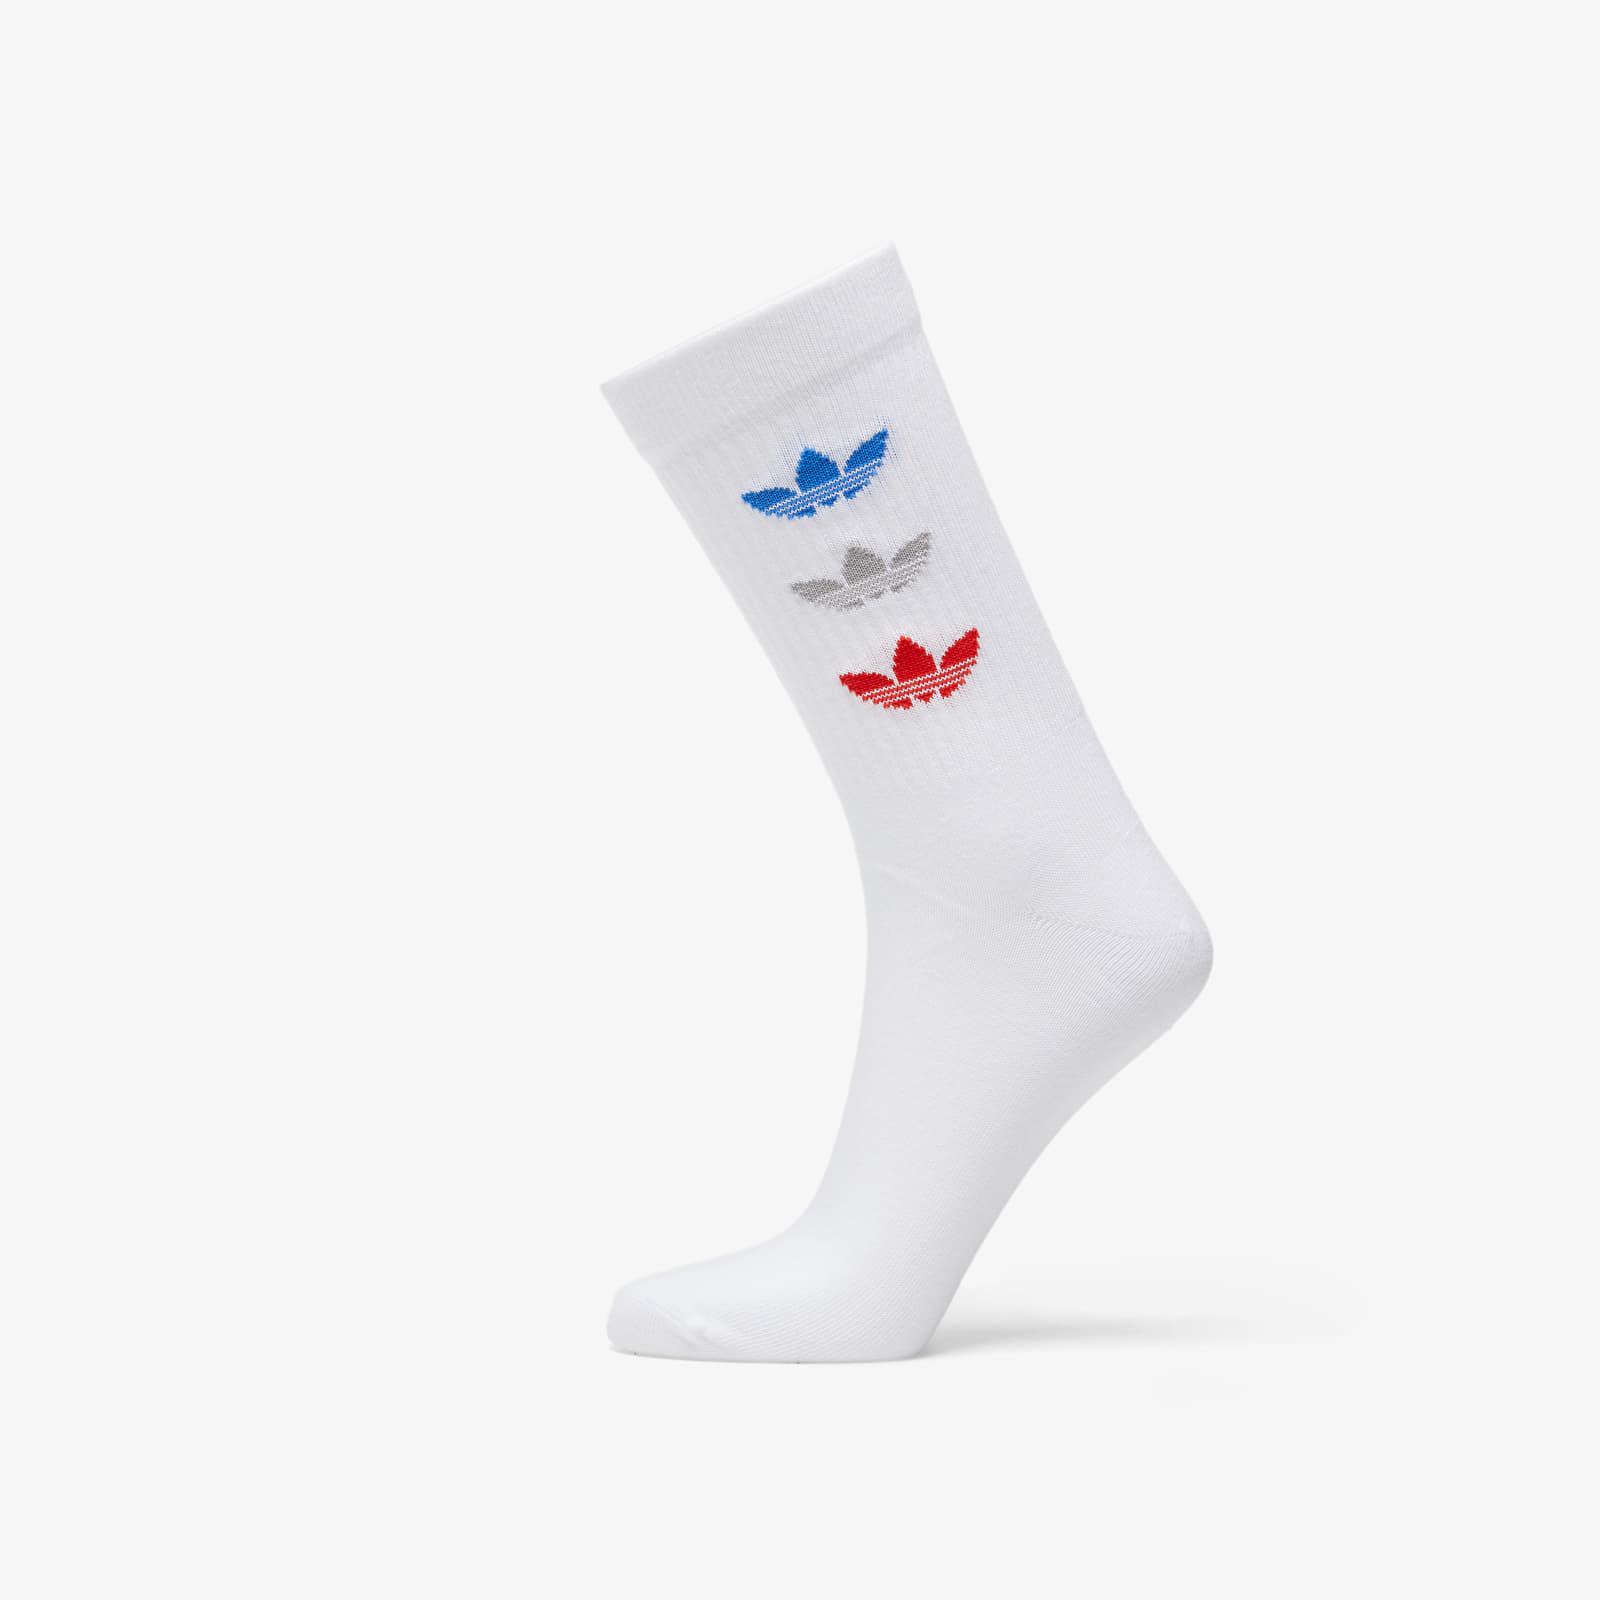 adidas Trefoil Thin Ribbed Crew Socks (2-pack) White 40-42